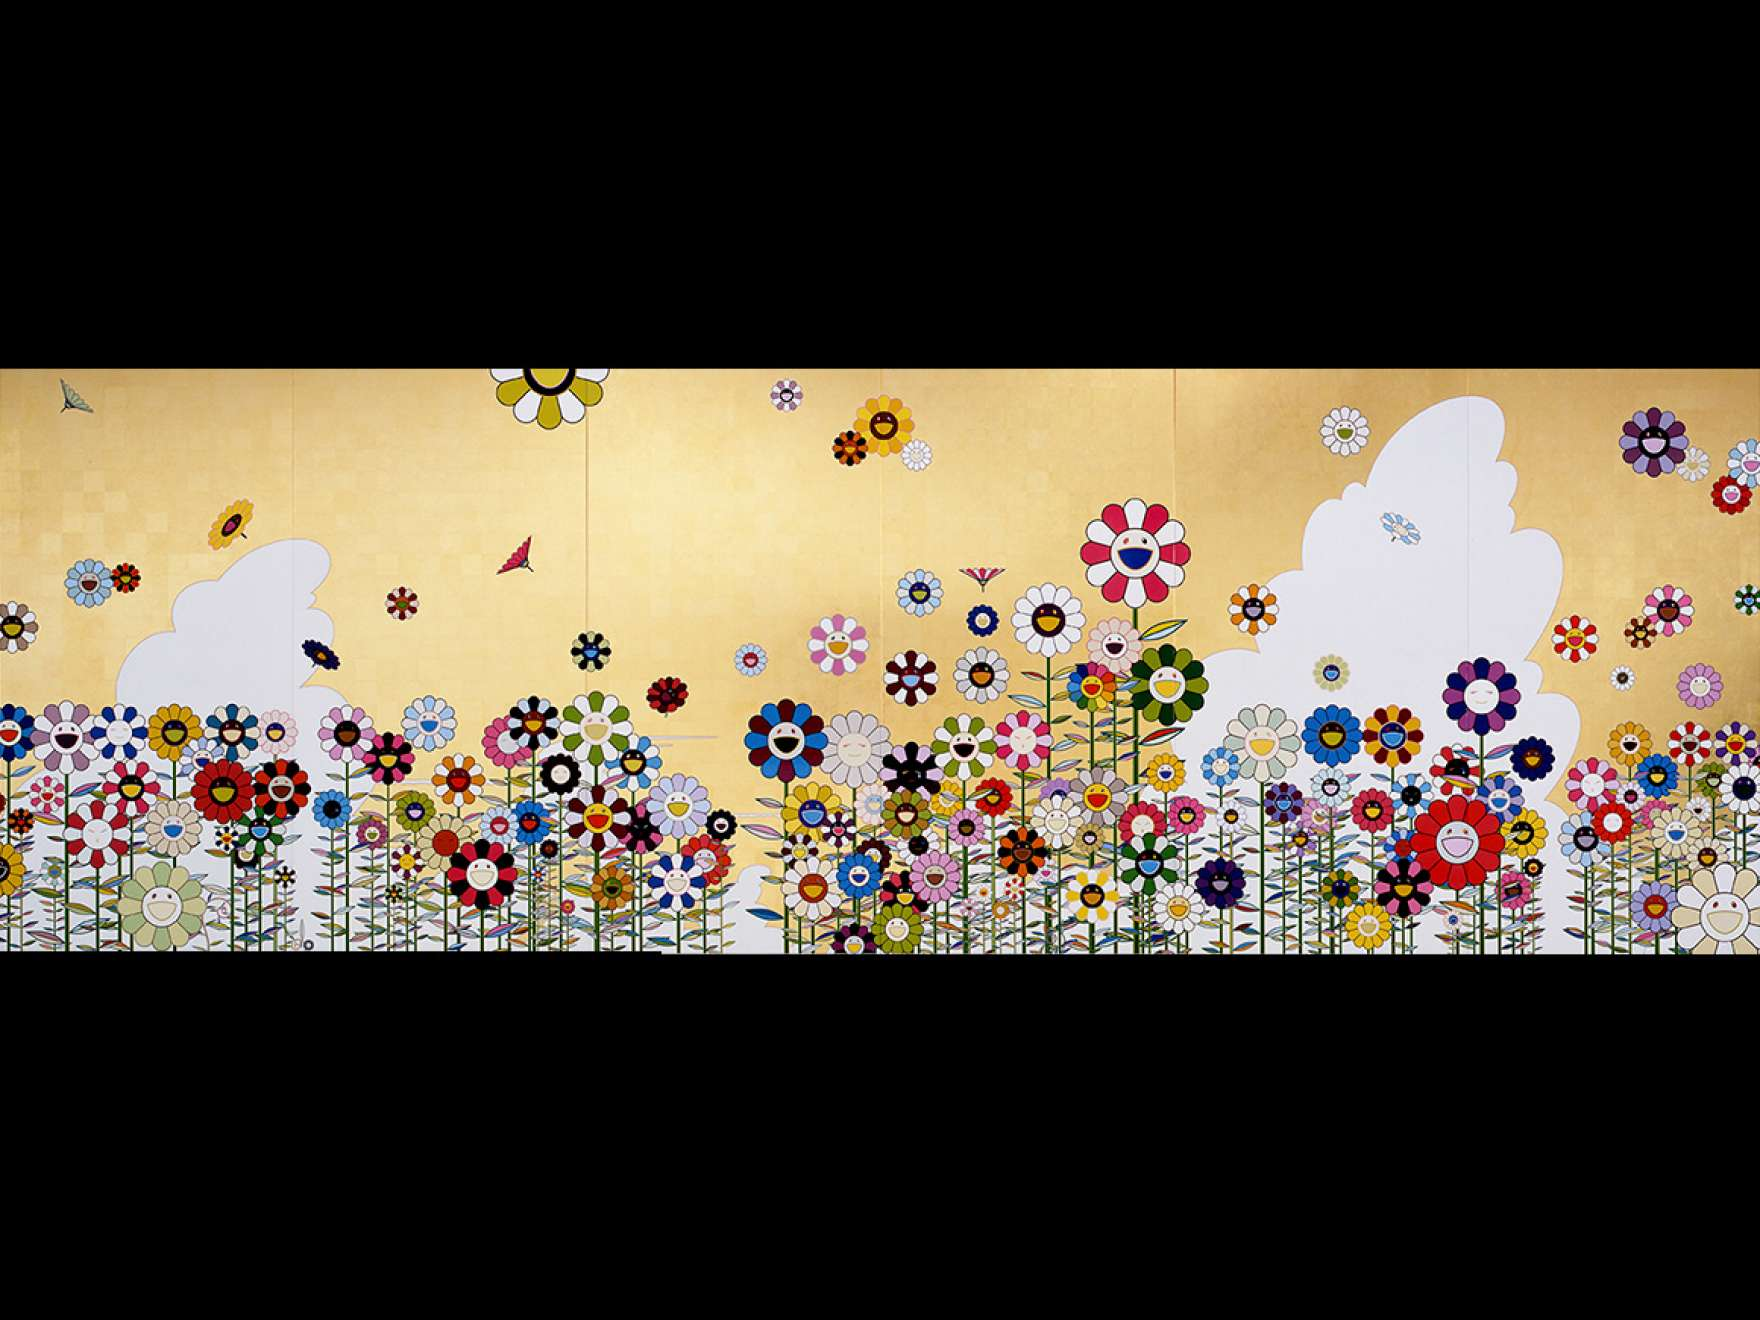 Takashi Murakami, Kawaii - vacances (Summer Vacation in the Kingdom of the Golden), 2008